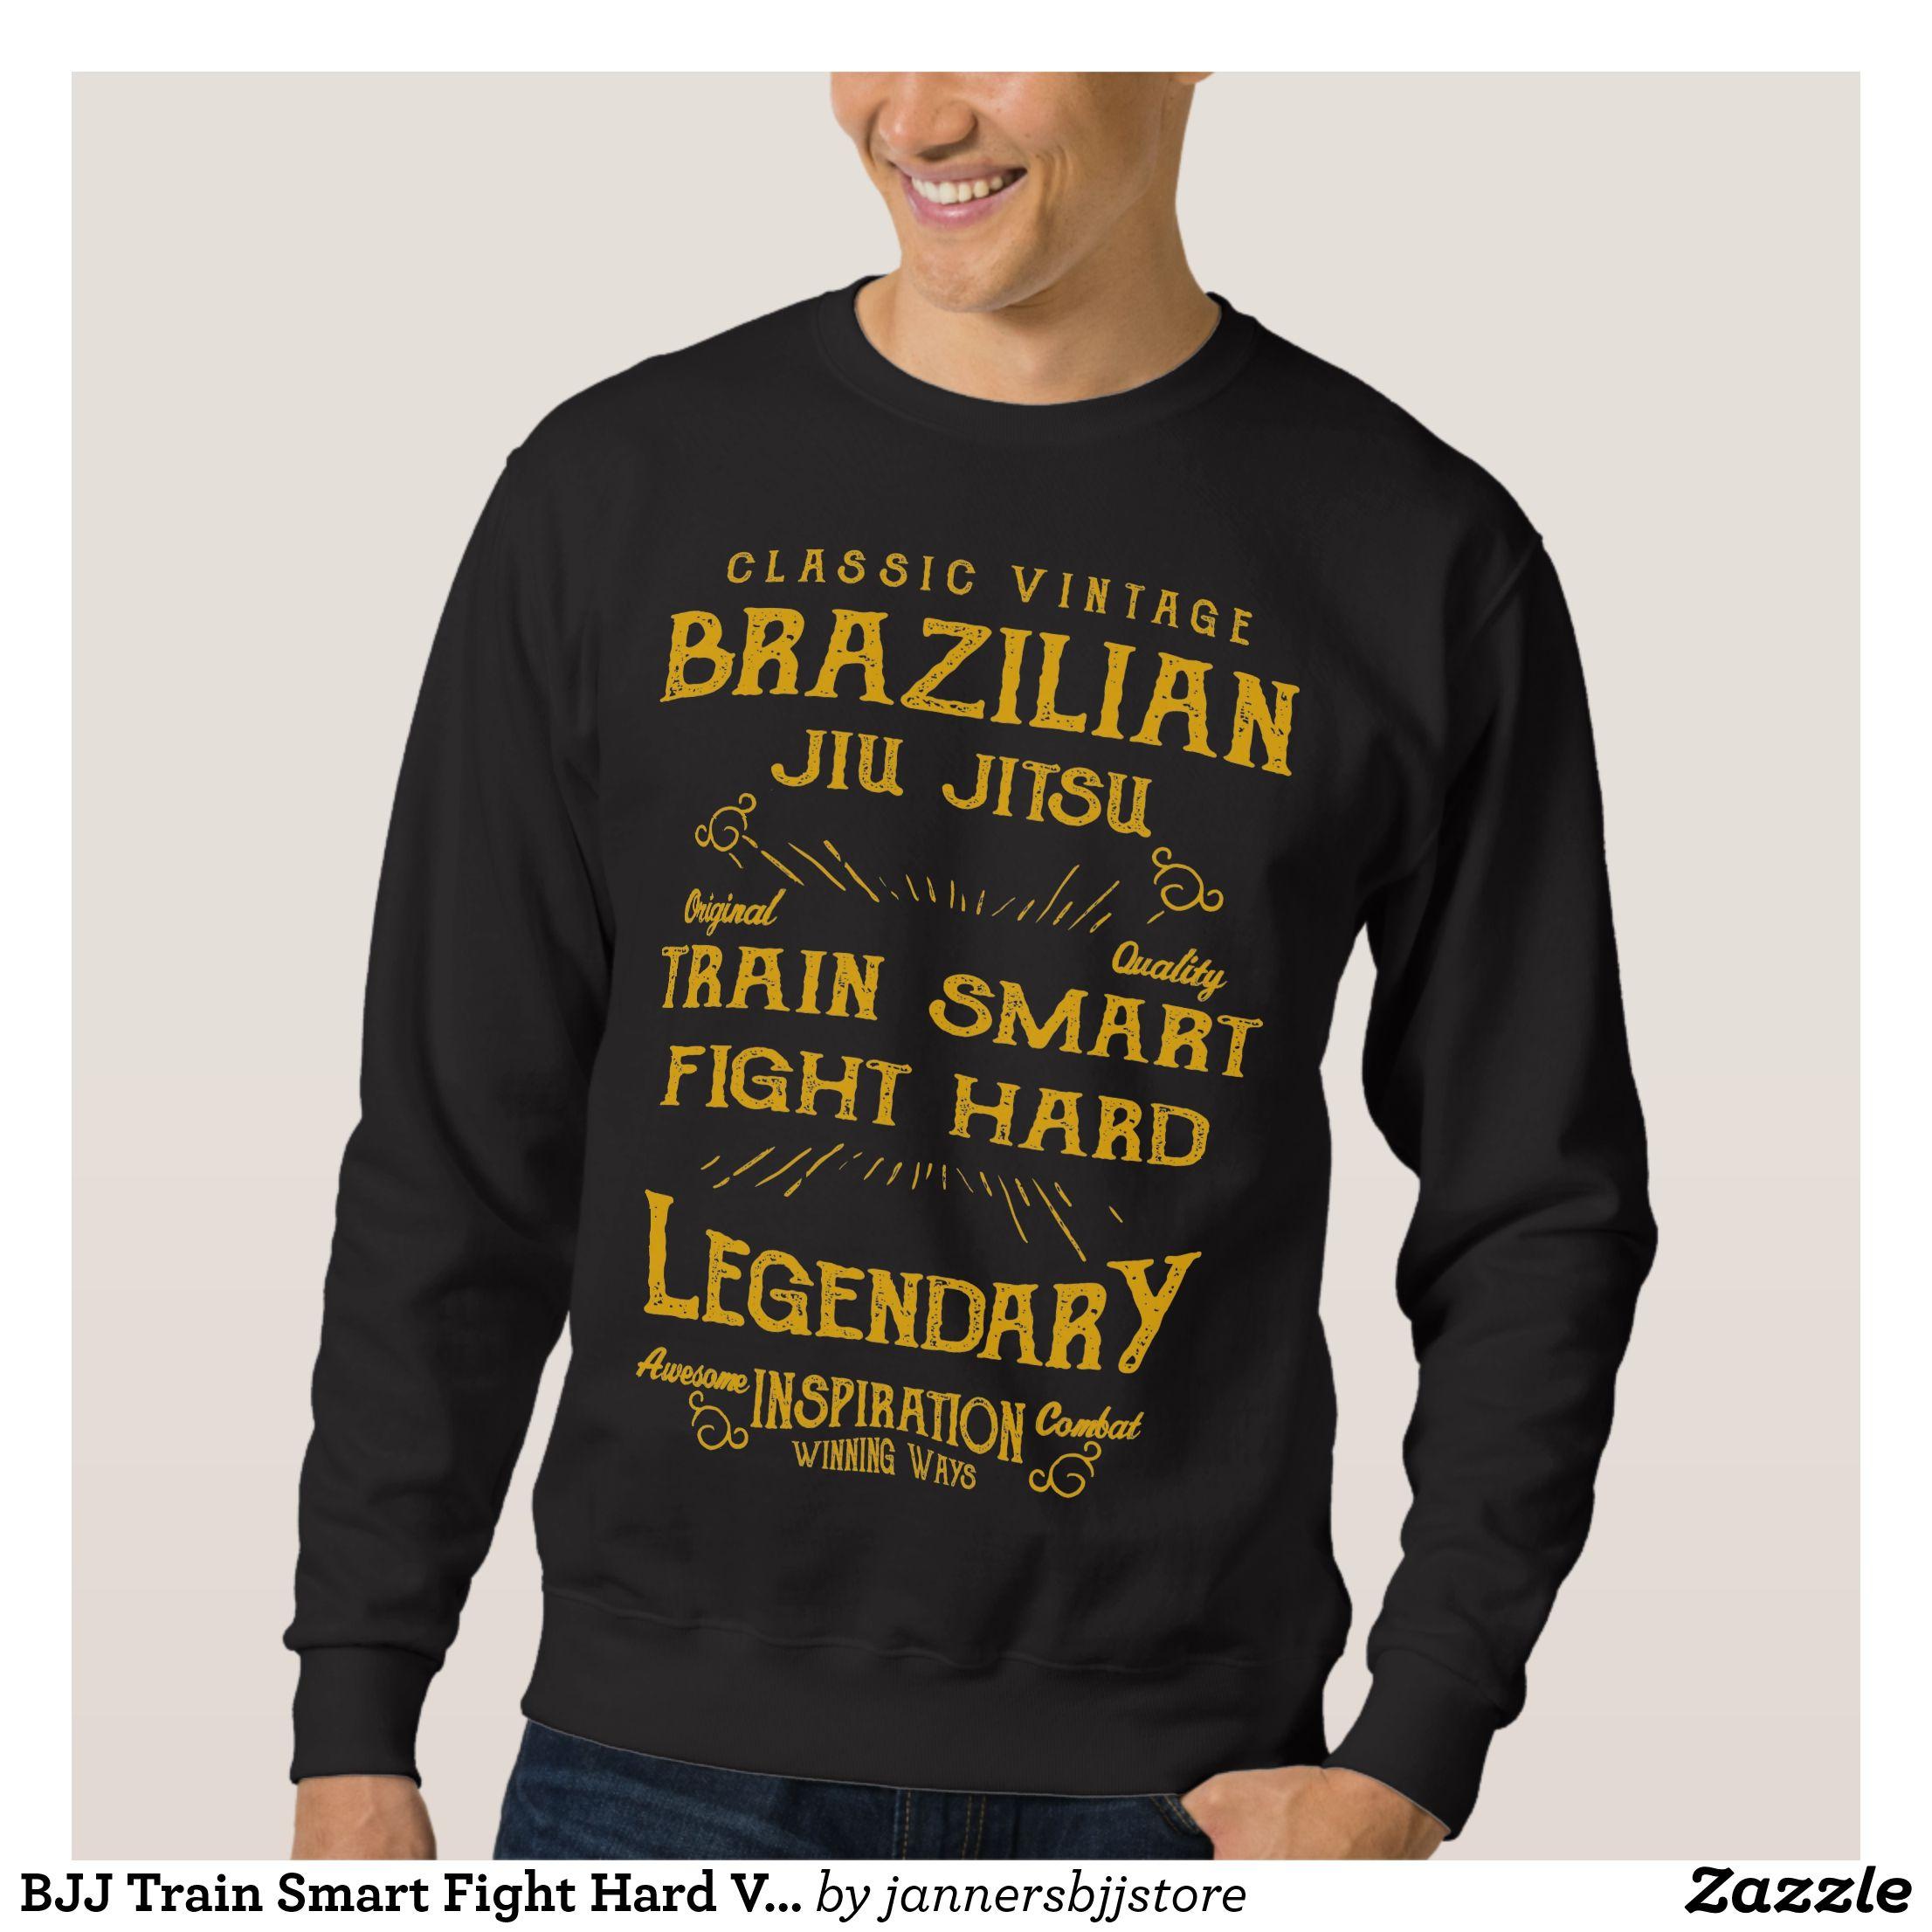 Bjj train smart fight hard vintage jiu jitsu sweatshirt